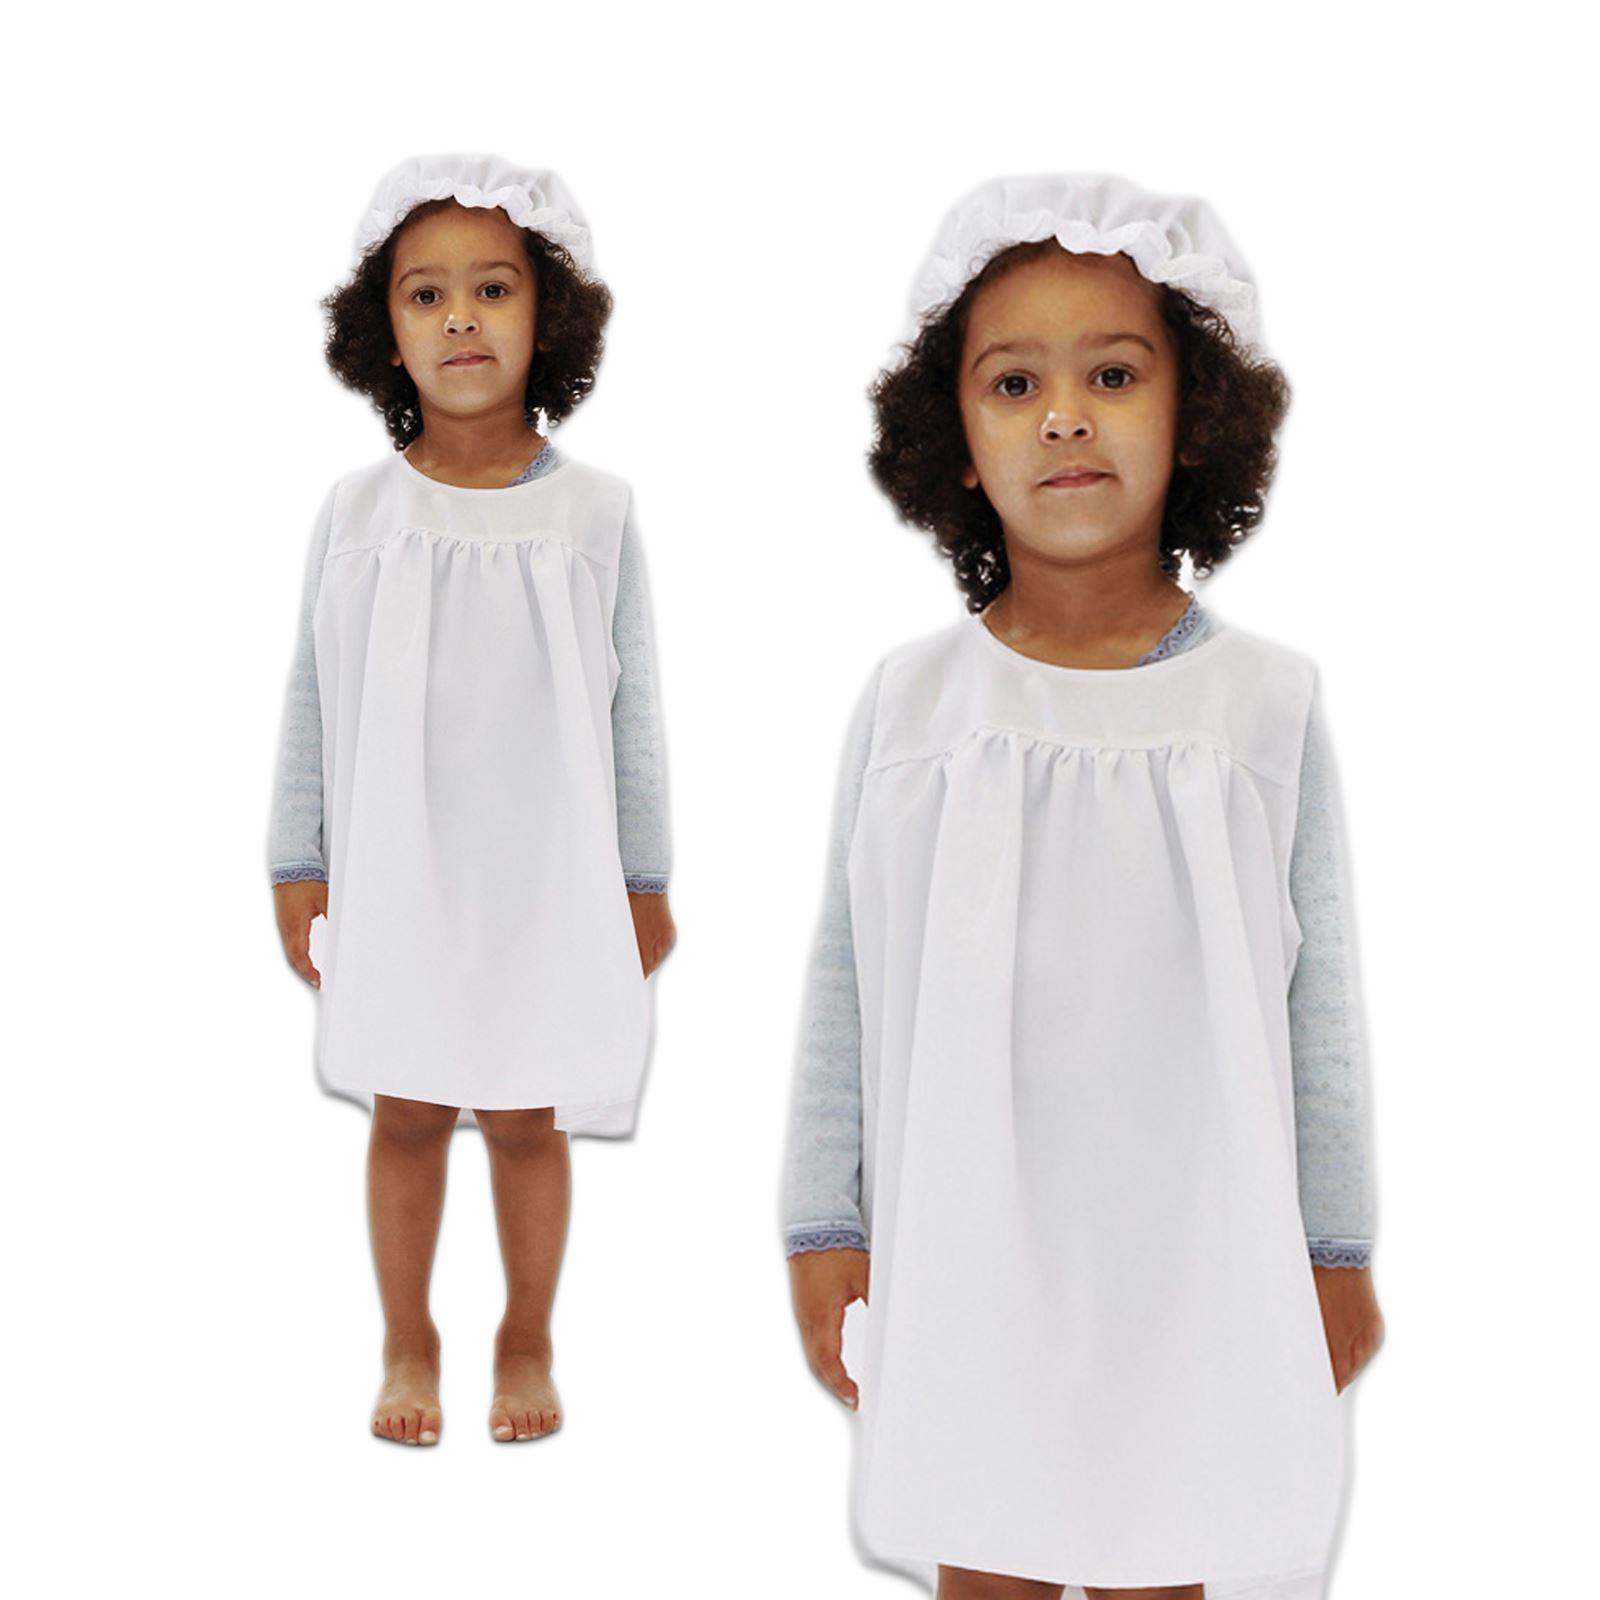 White tudor apron - Click To Close Full Size